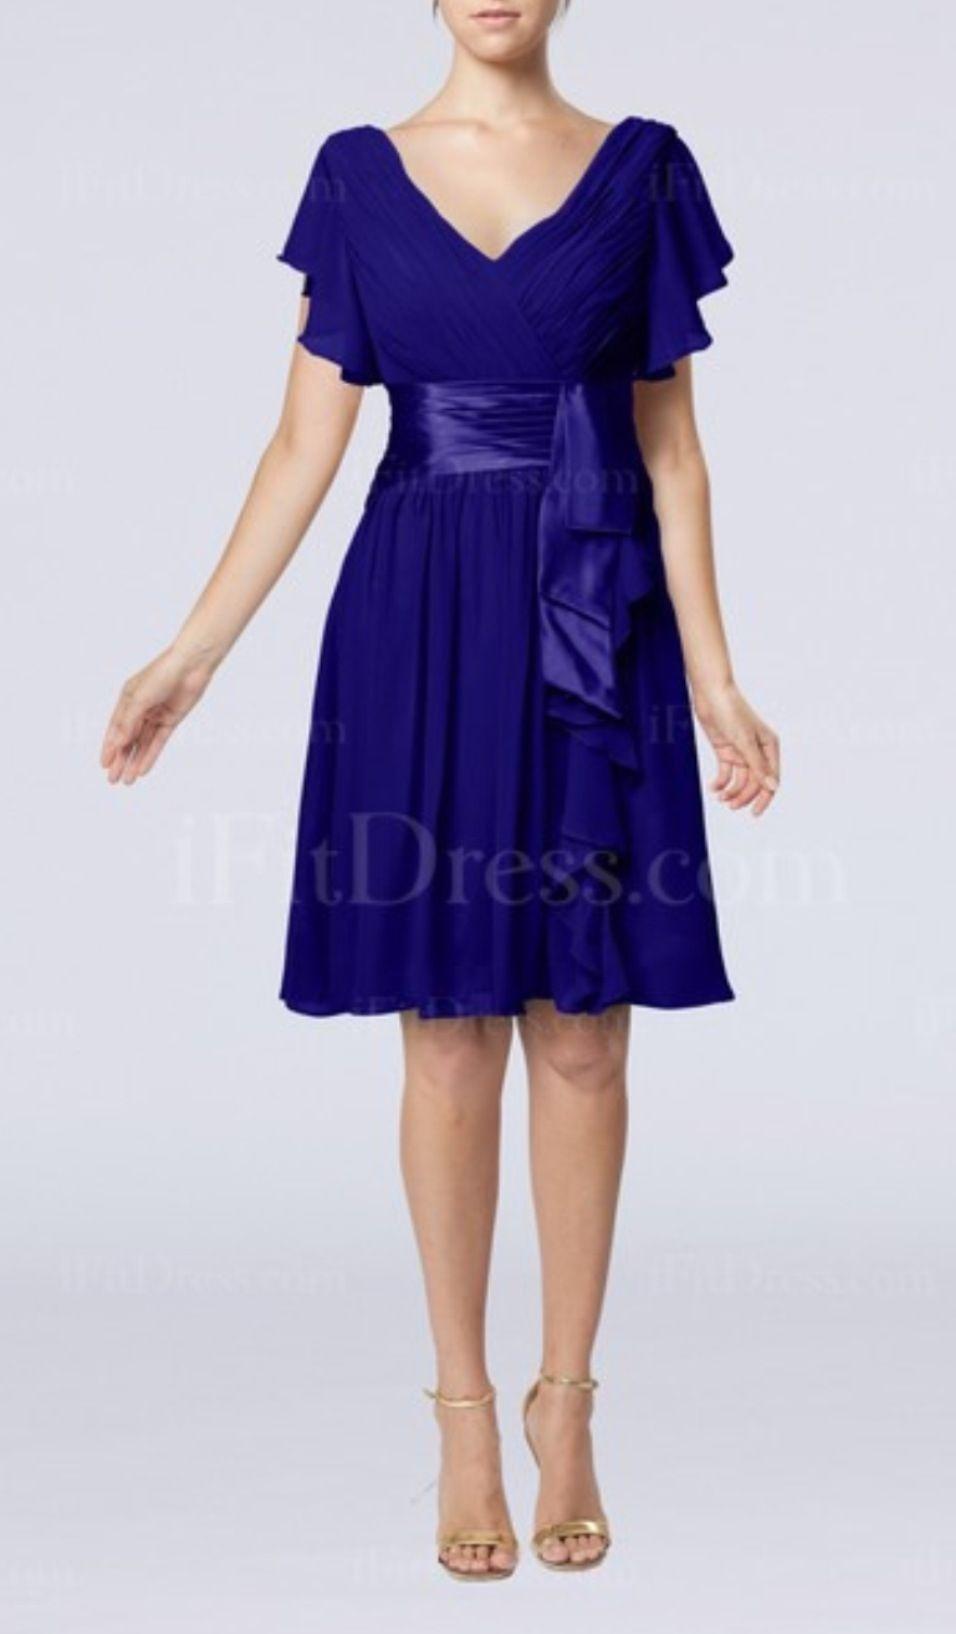 Royal blue wedding dresses plus size  Royal blue dress  Fashion  Pinterest  Royal blue dresses Blue